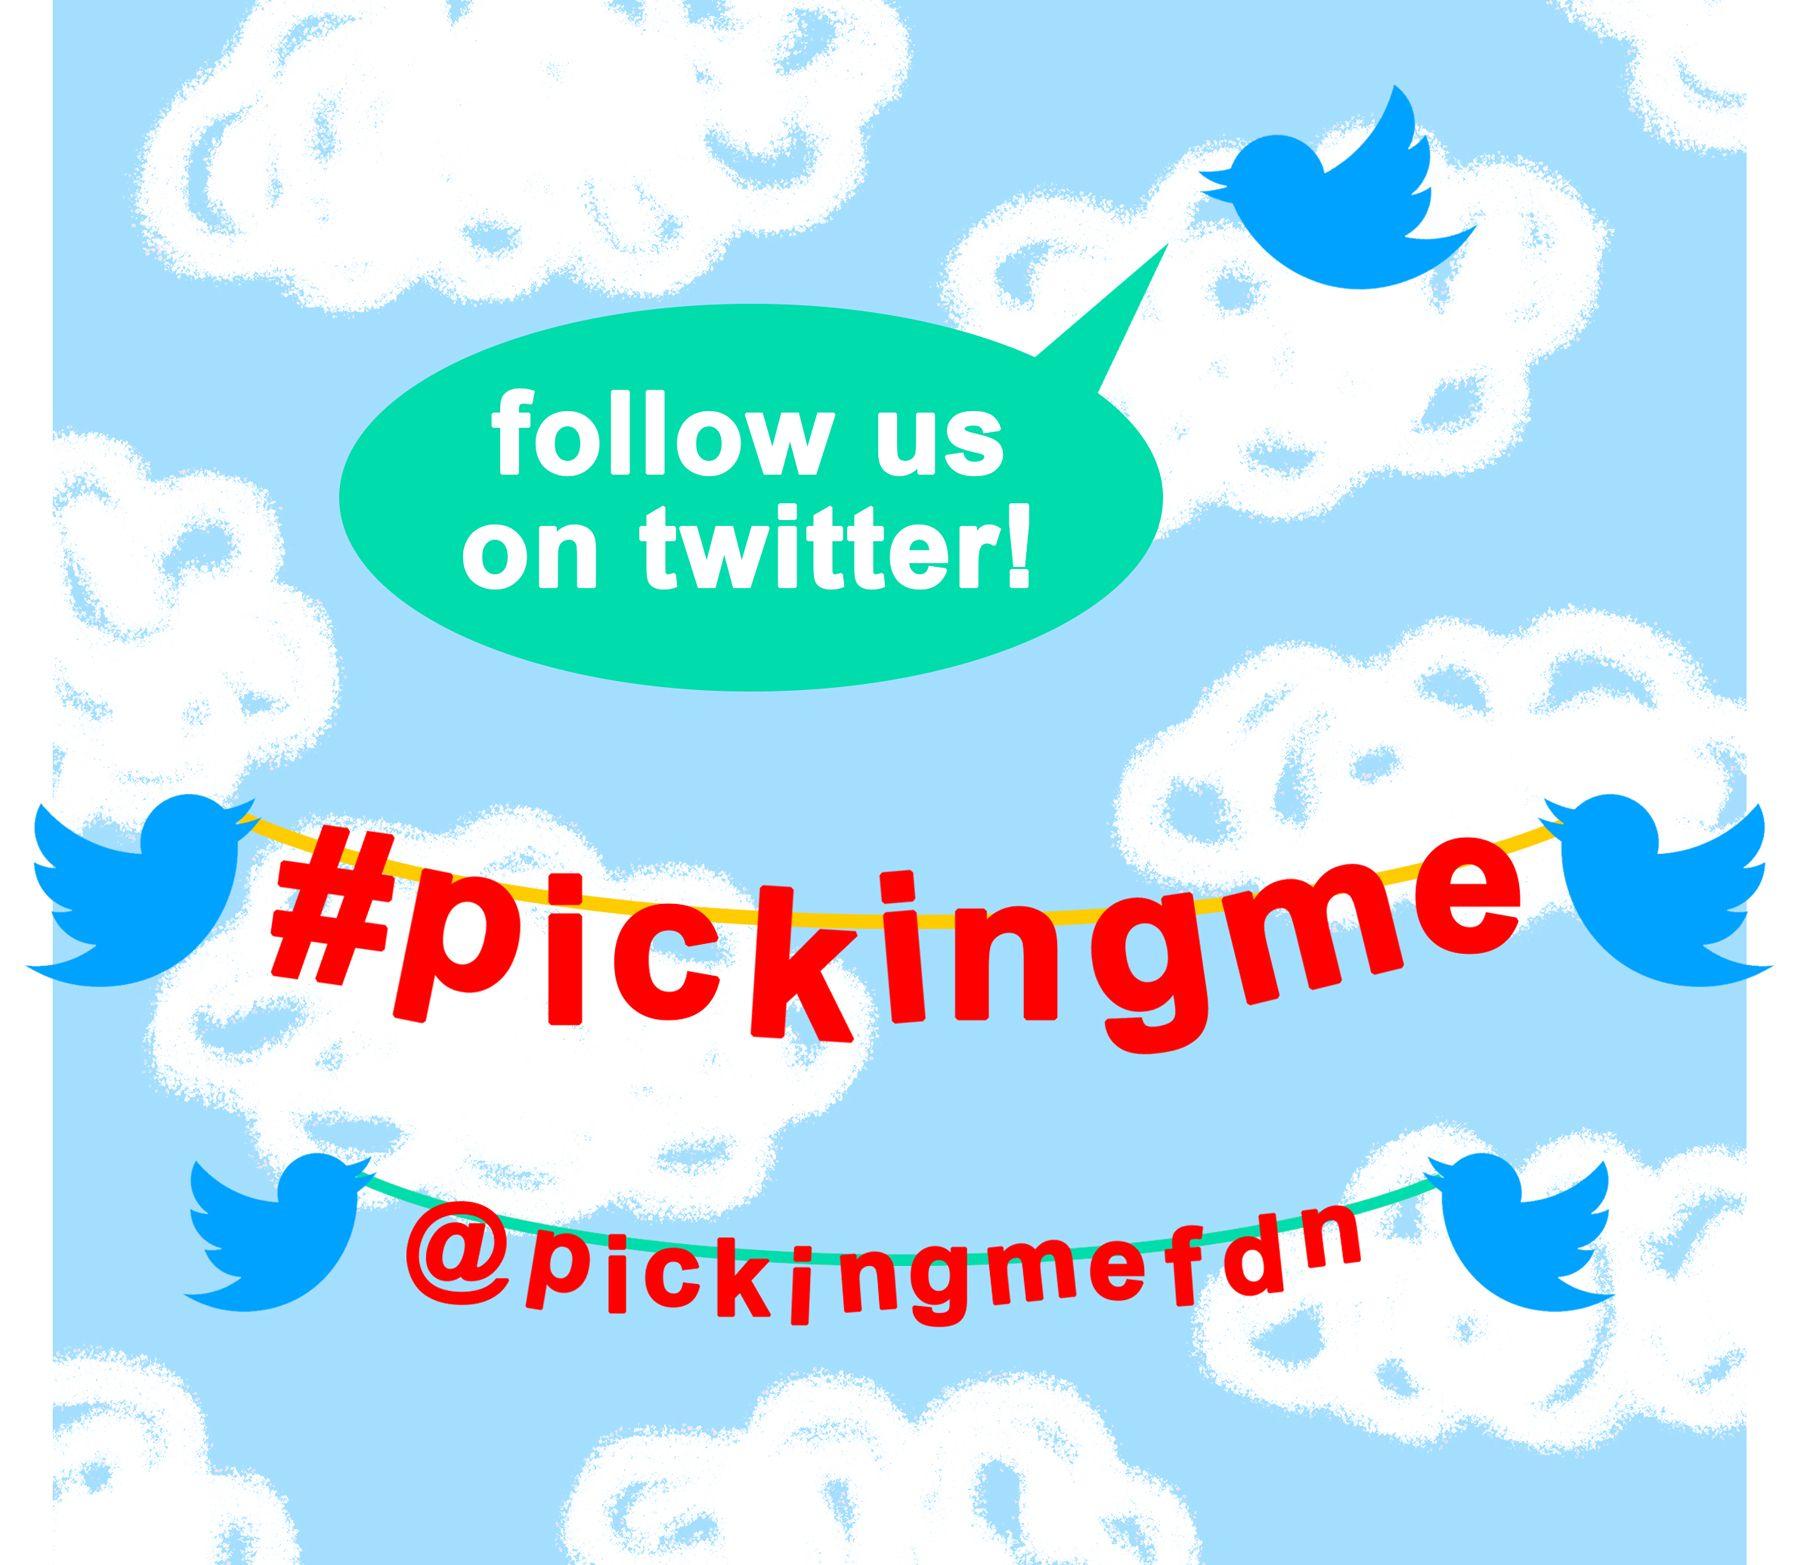 Follow #PickingMe on Twitter!